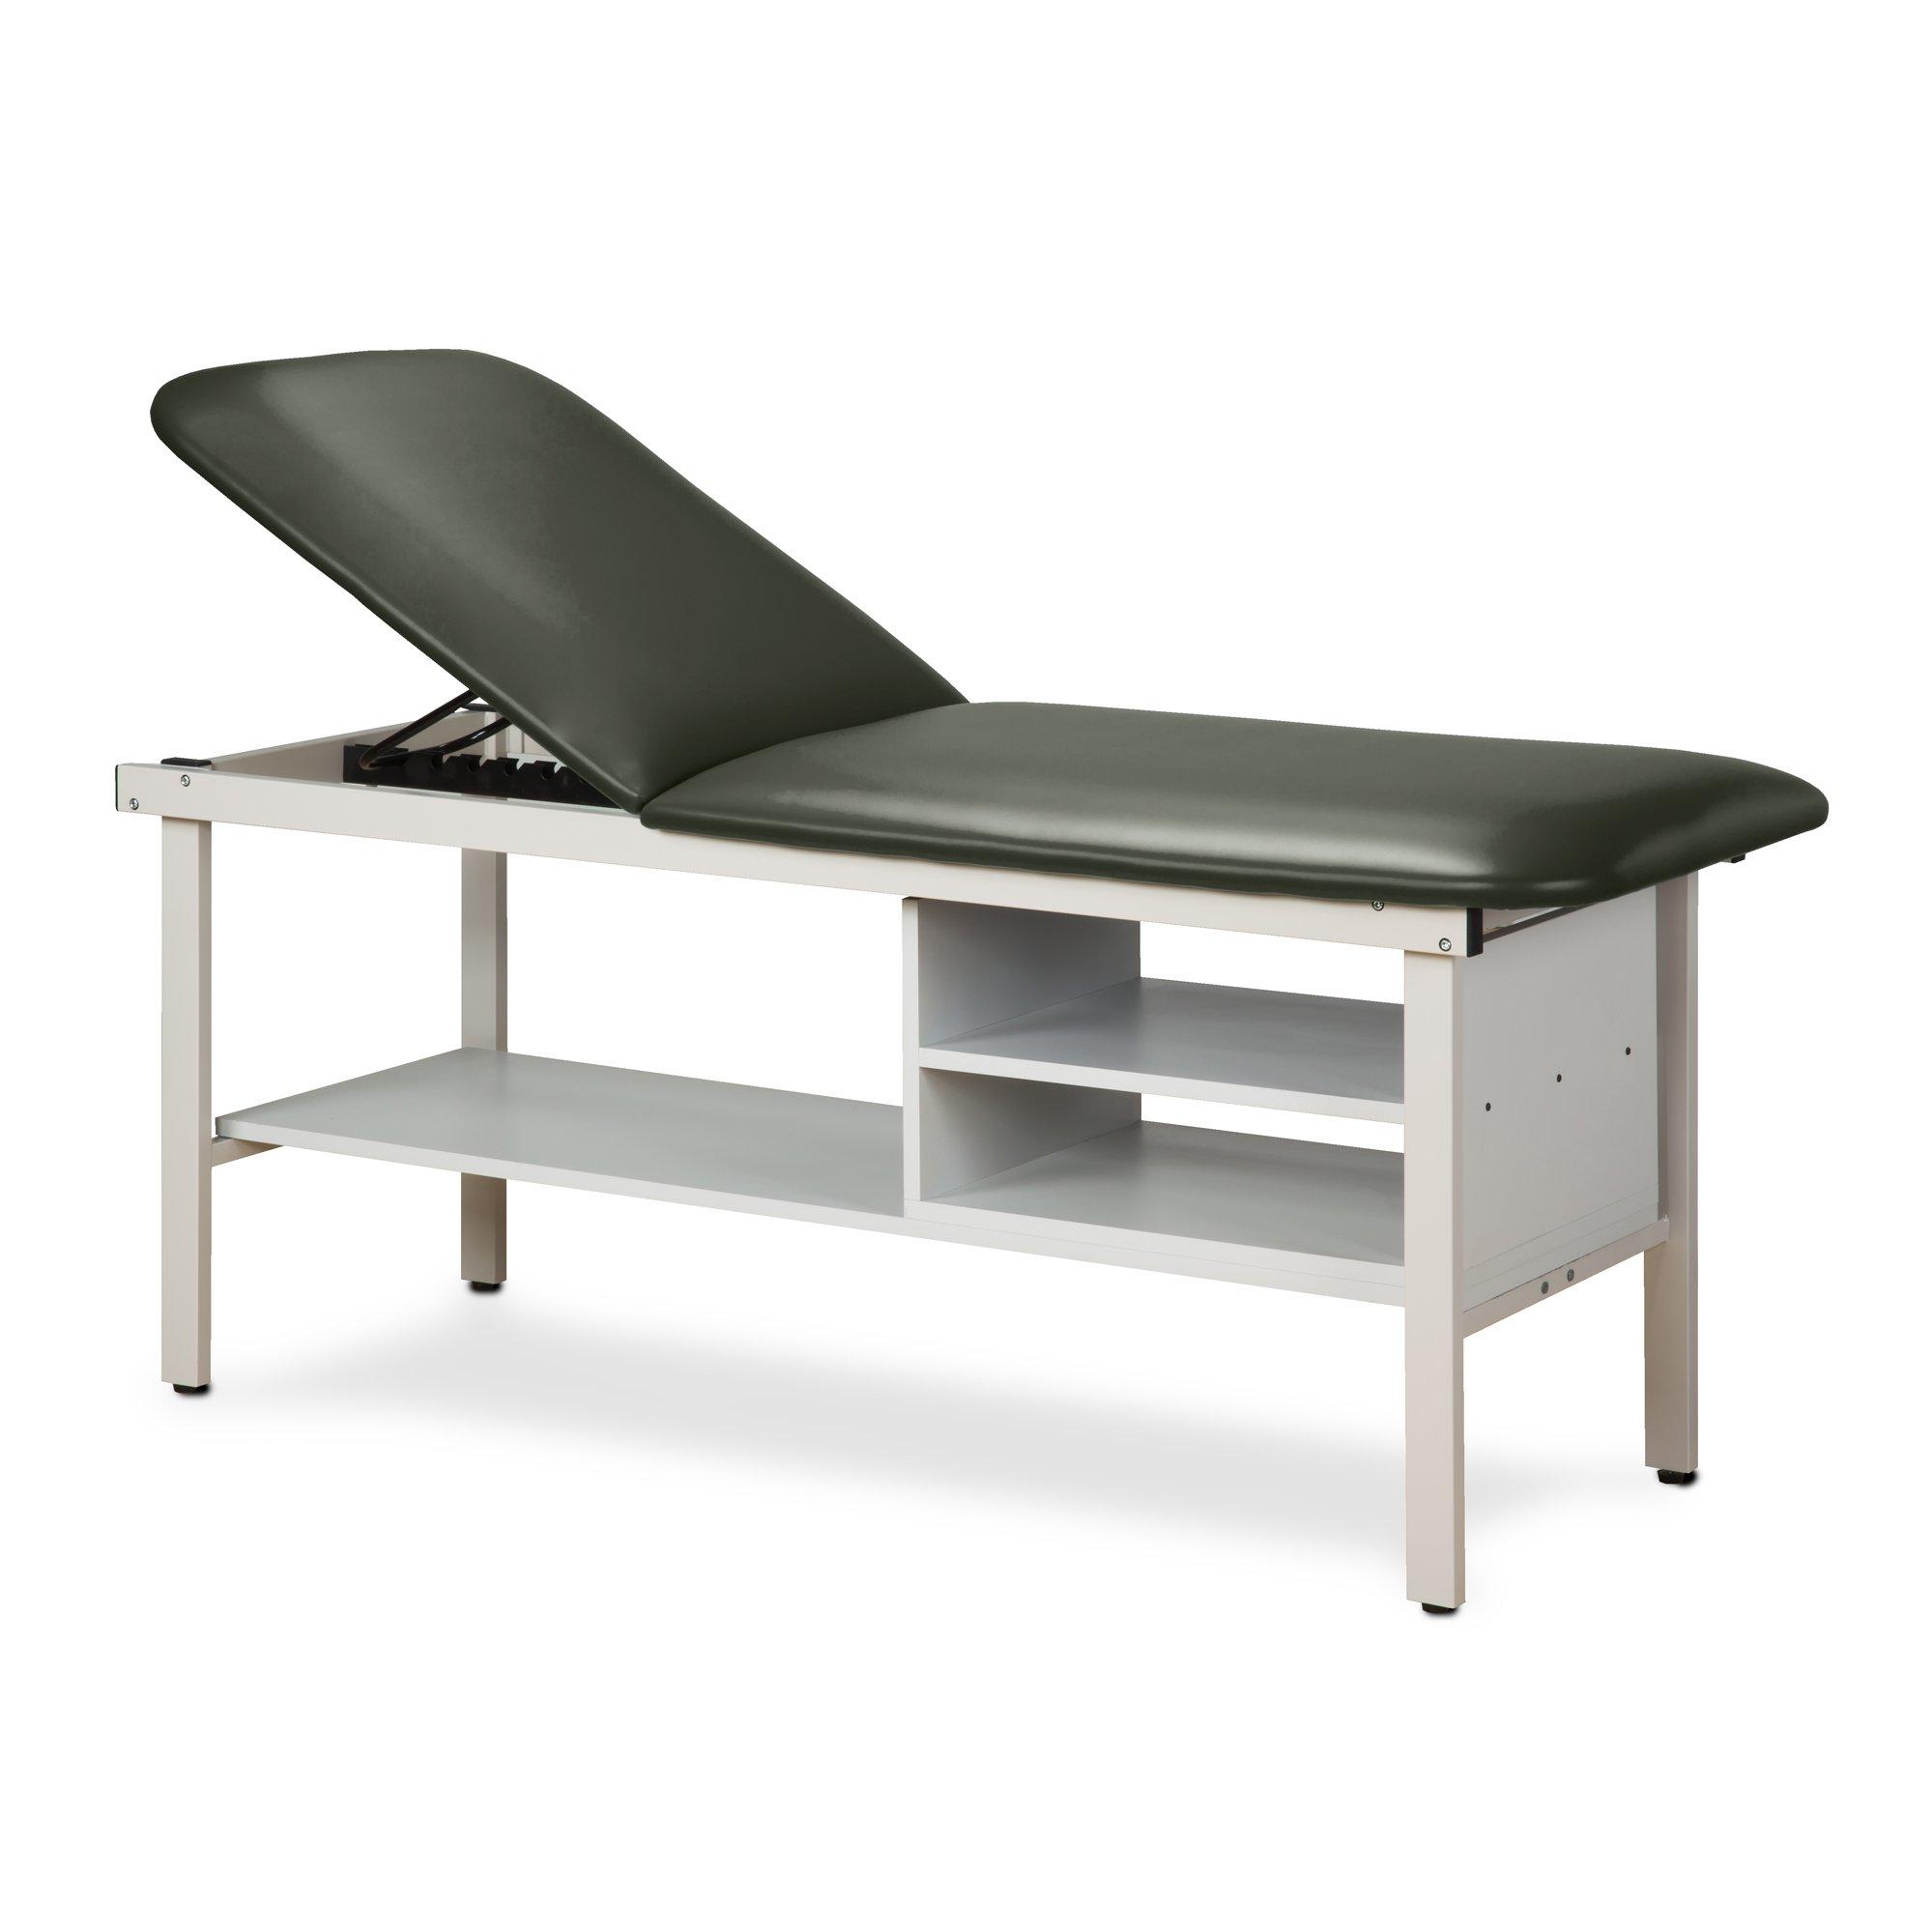 30'' Width Alpha Treatment Table with 2 shelves Gunmetal